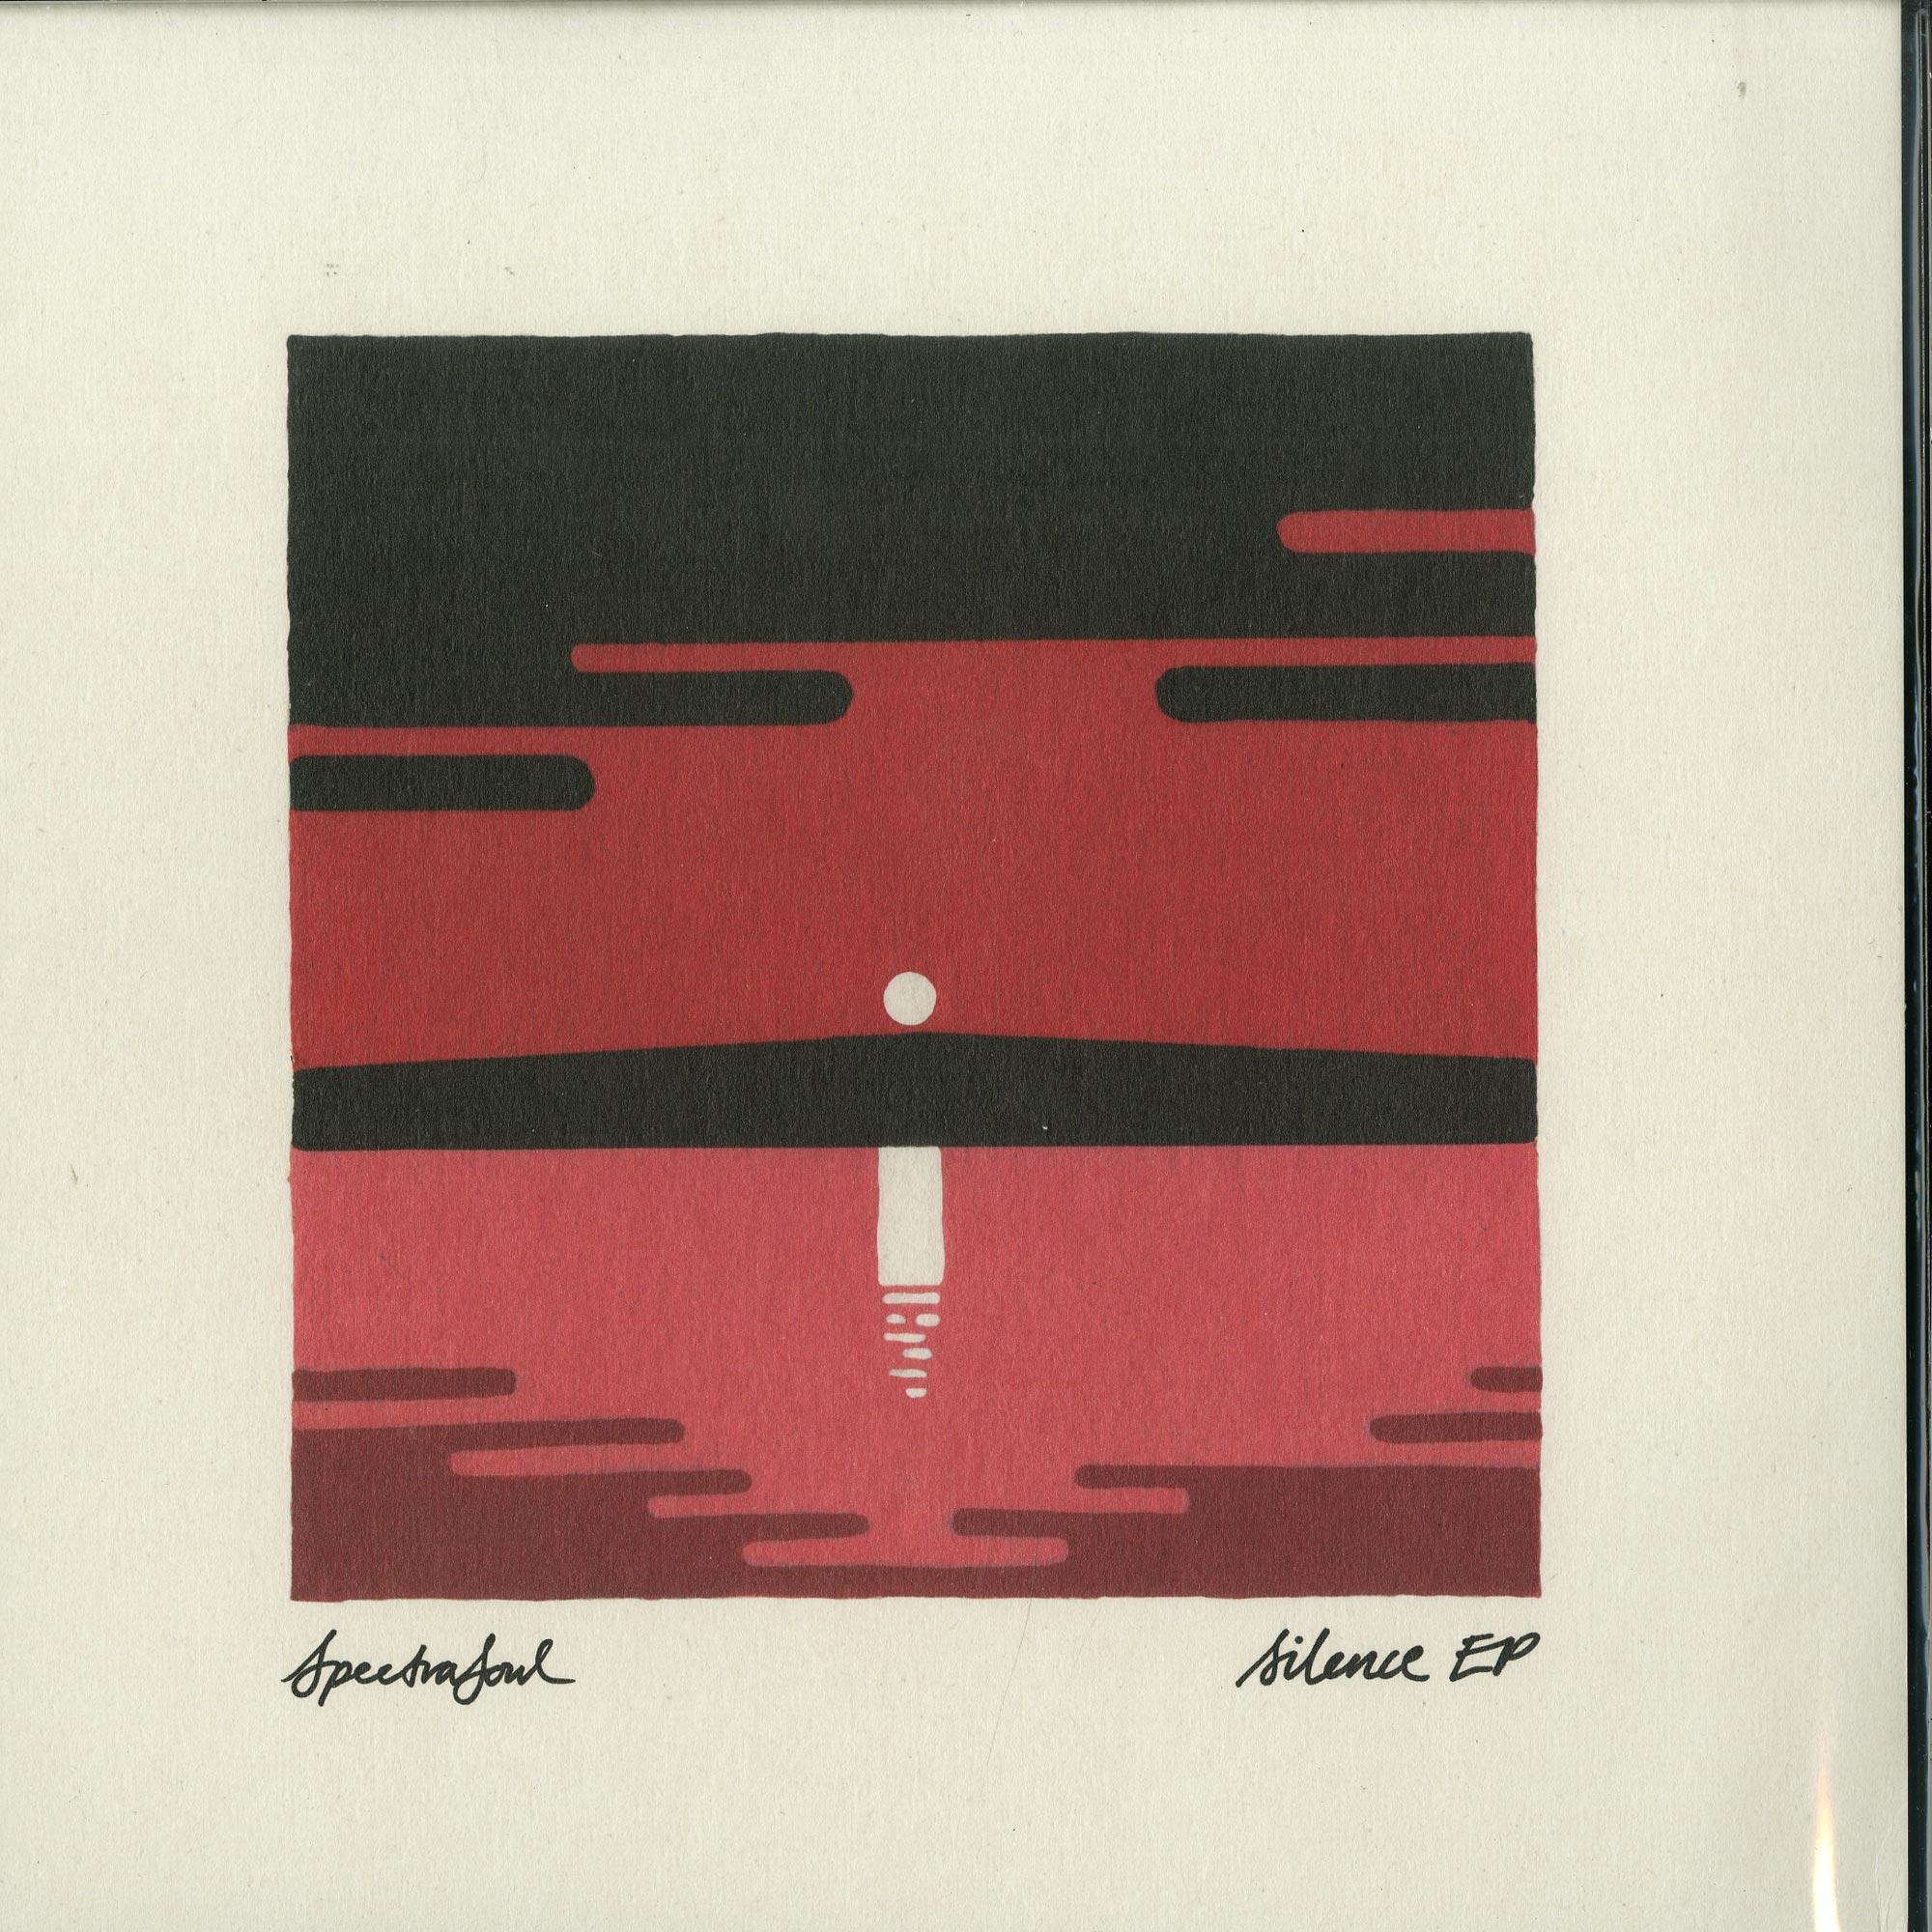 SpectraSoul - SILENCE EP